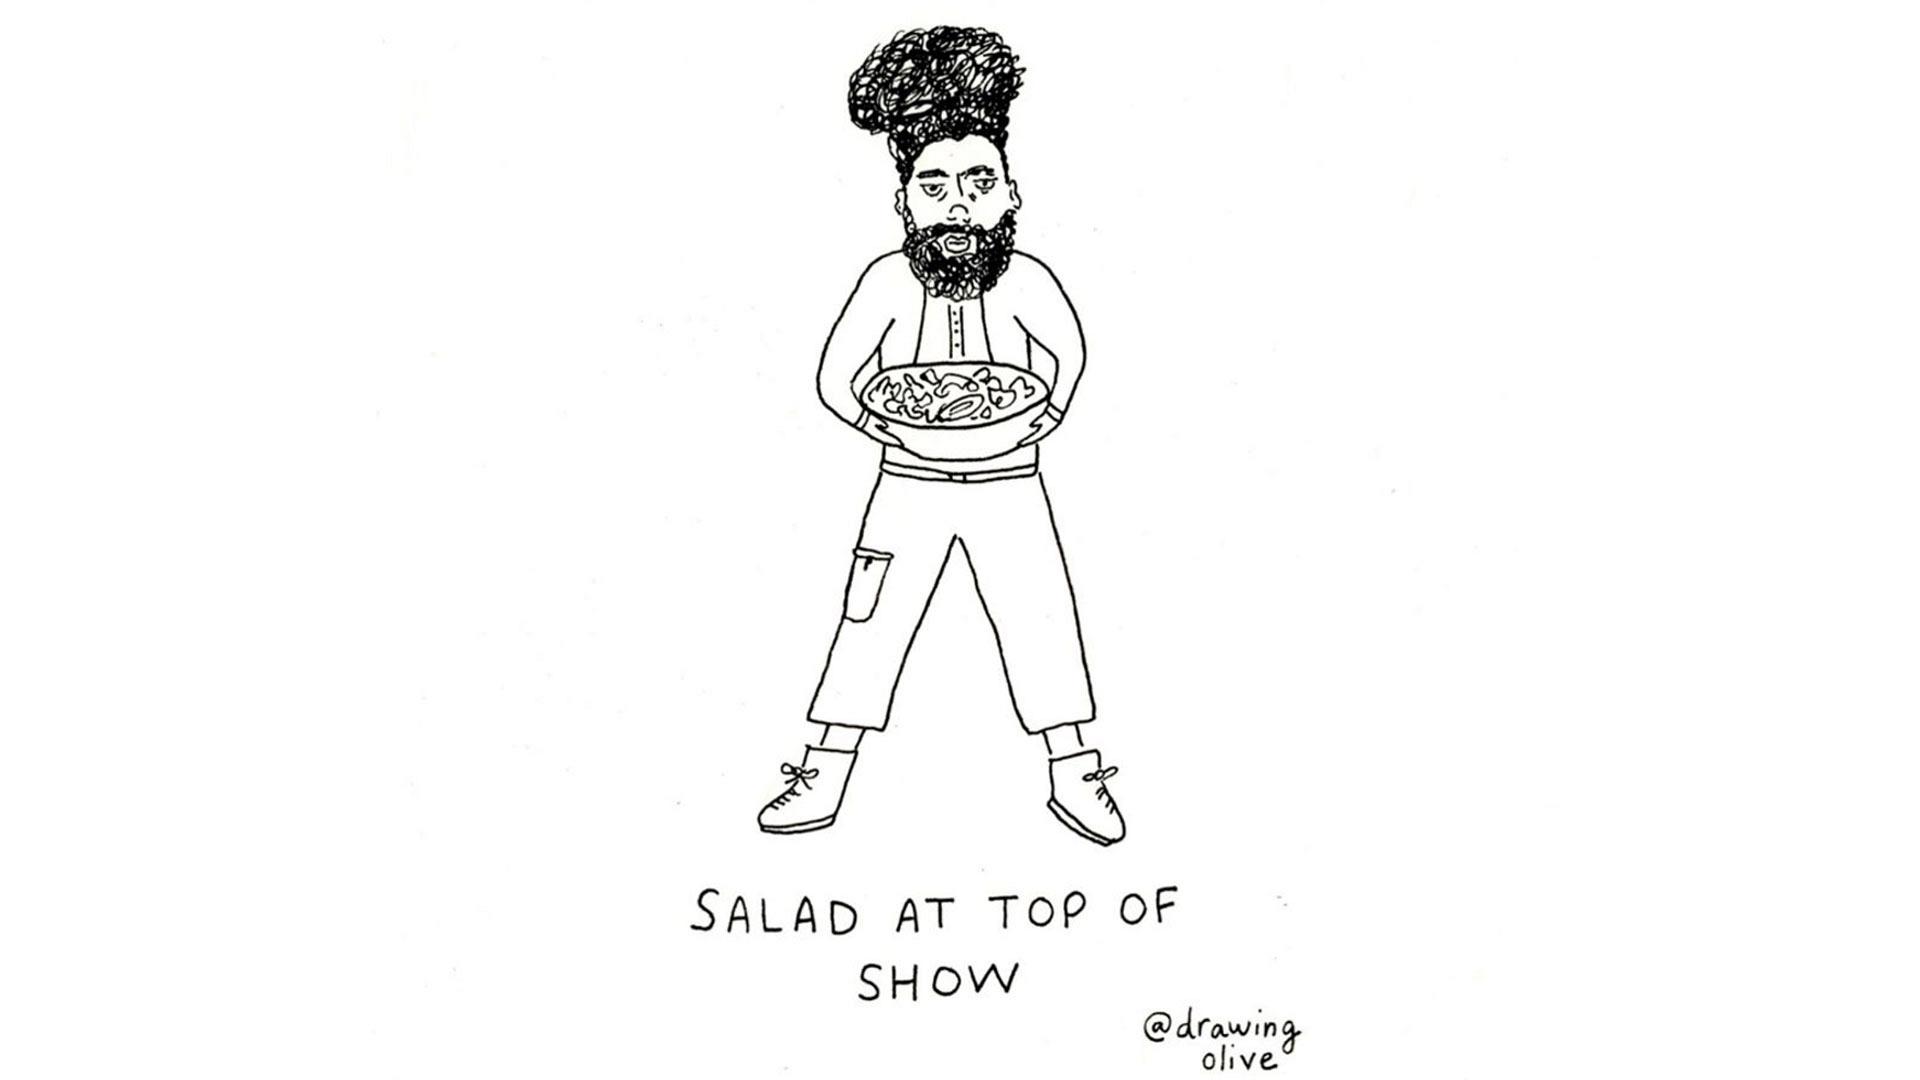 Salad At Top Of Show